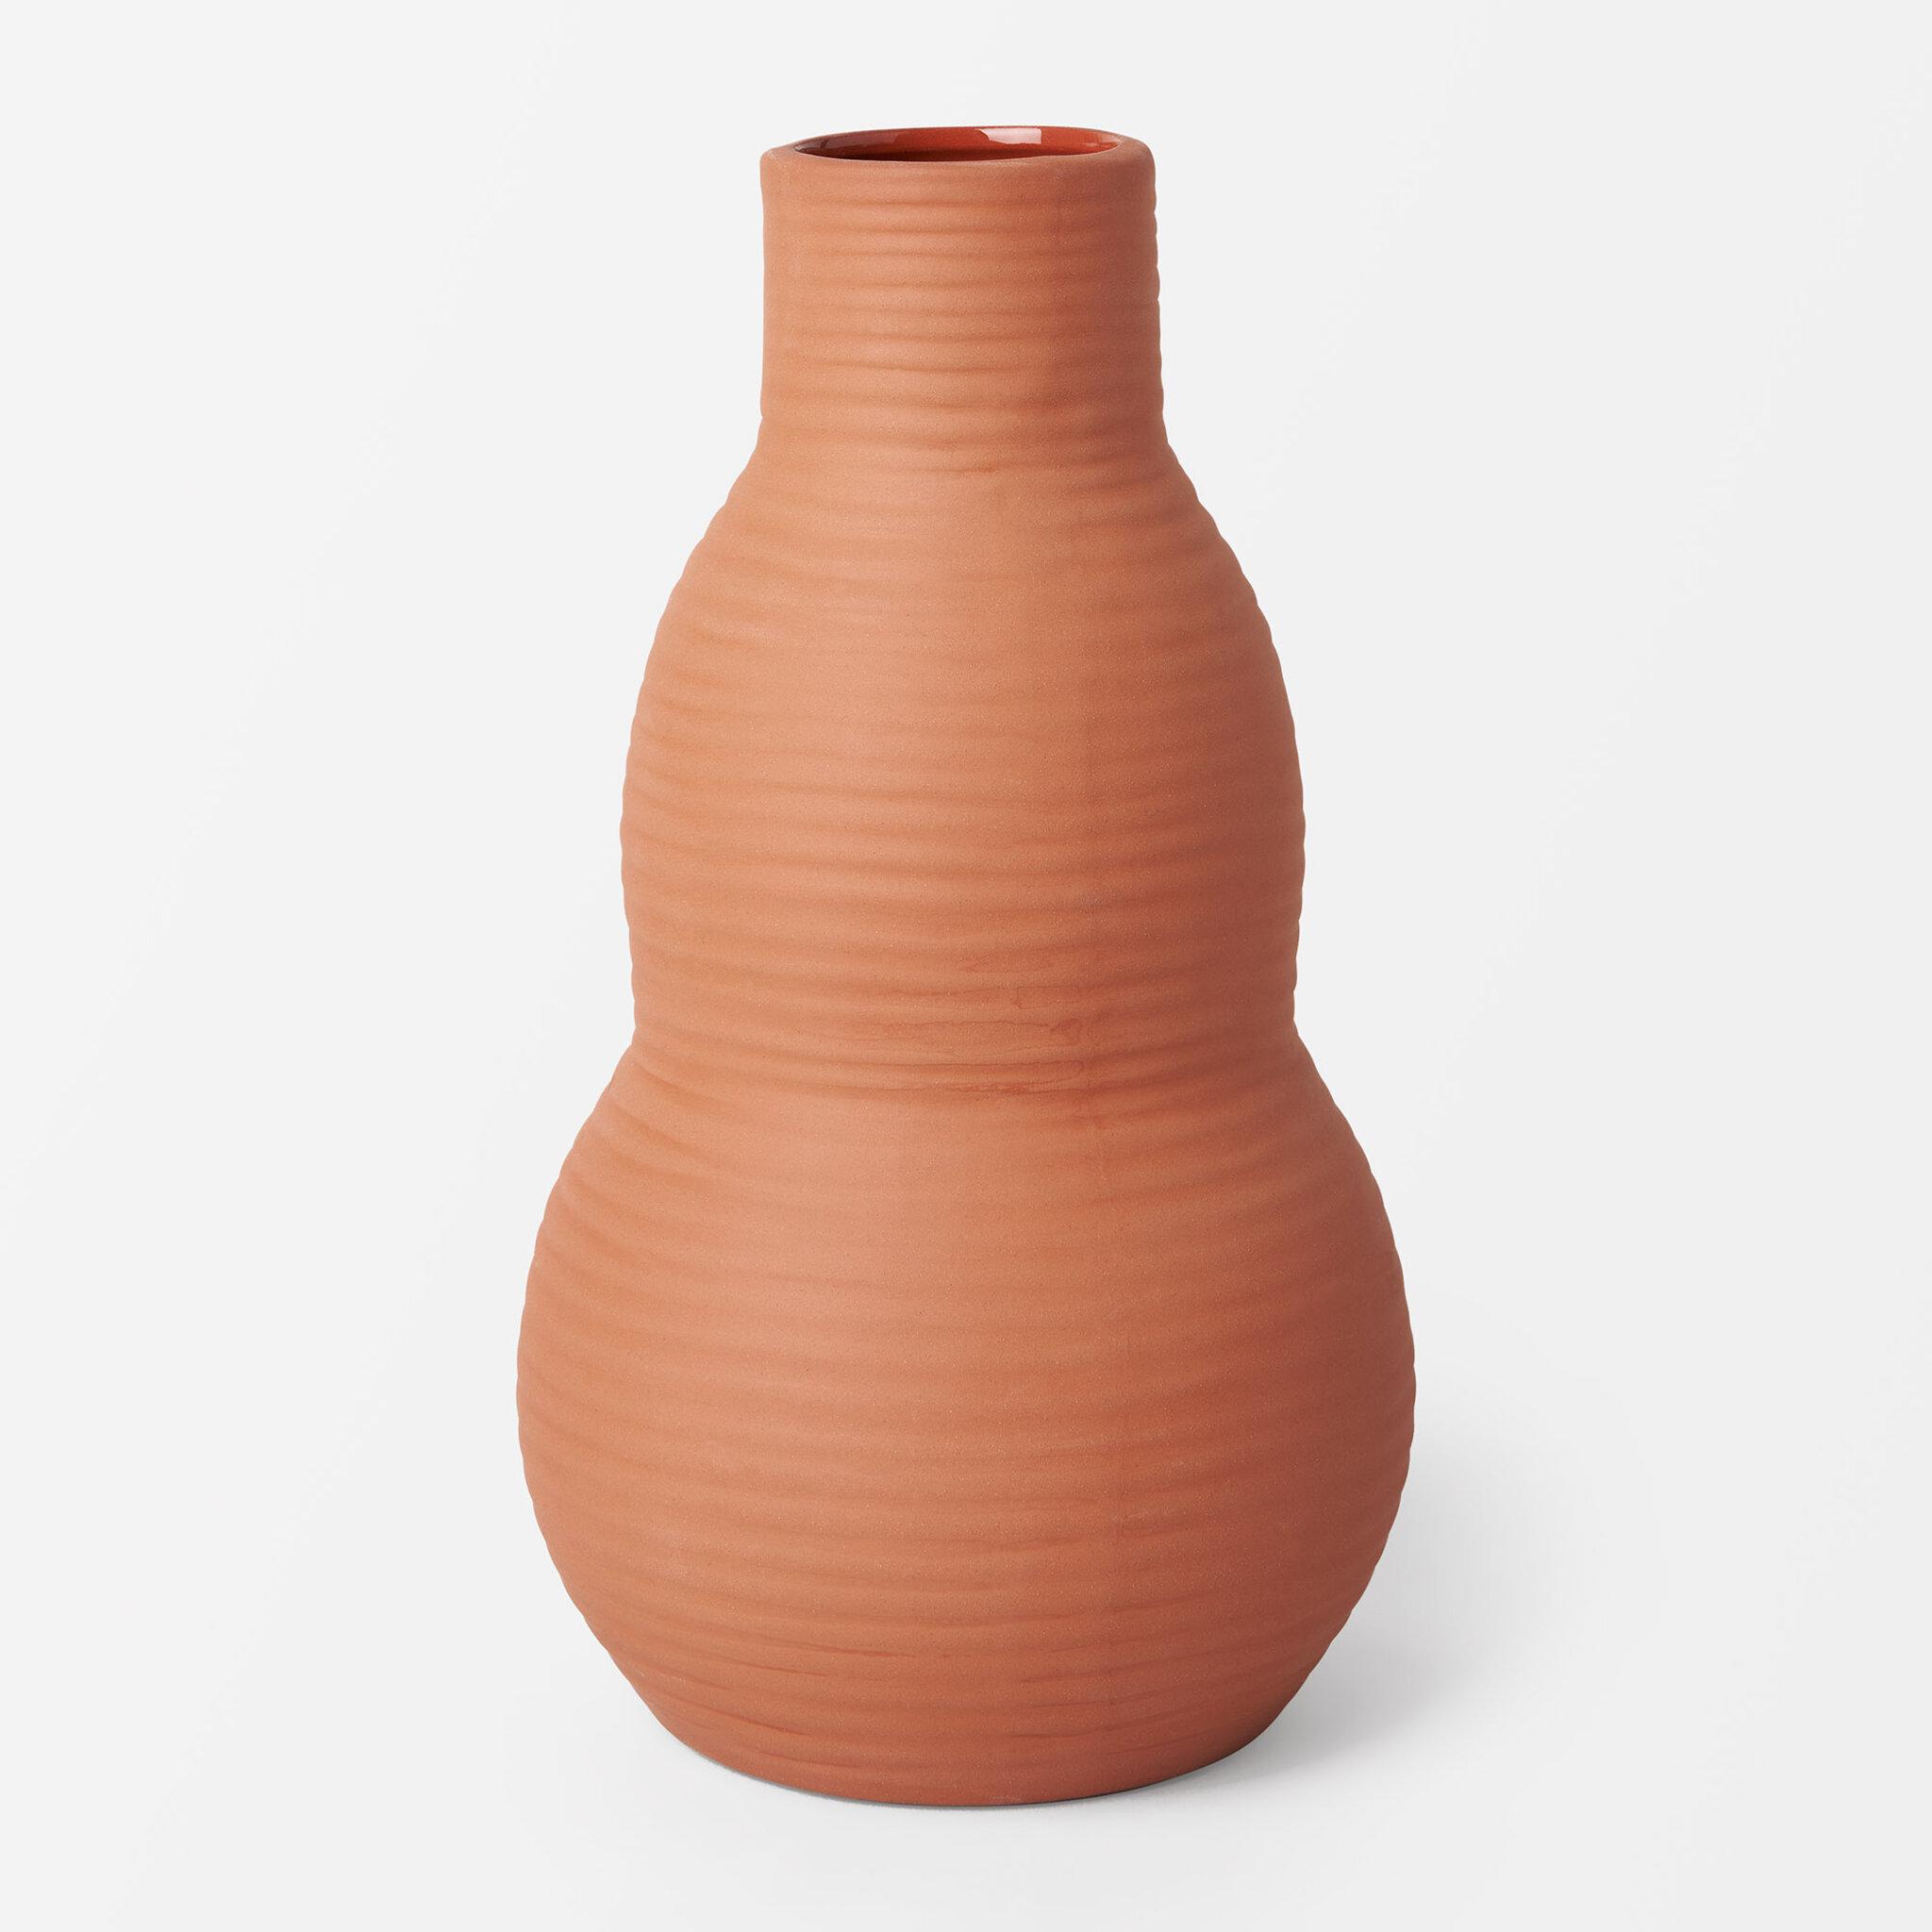 Vas i terrakotta TUA, Dia11,6xH20,2cm